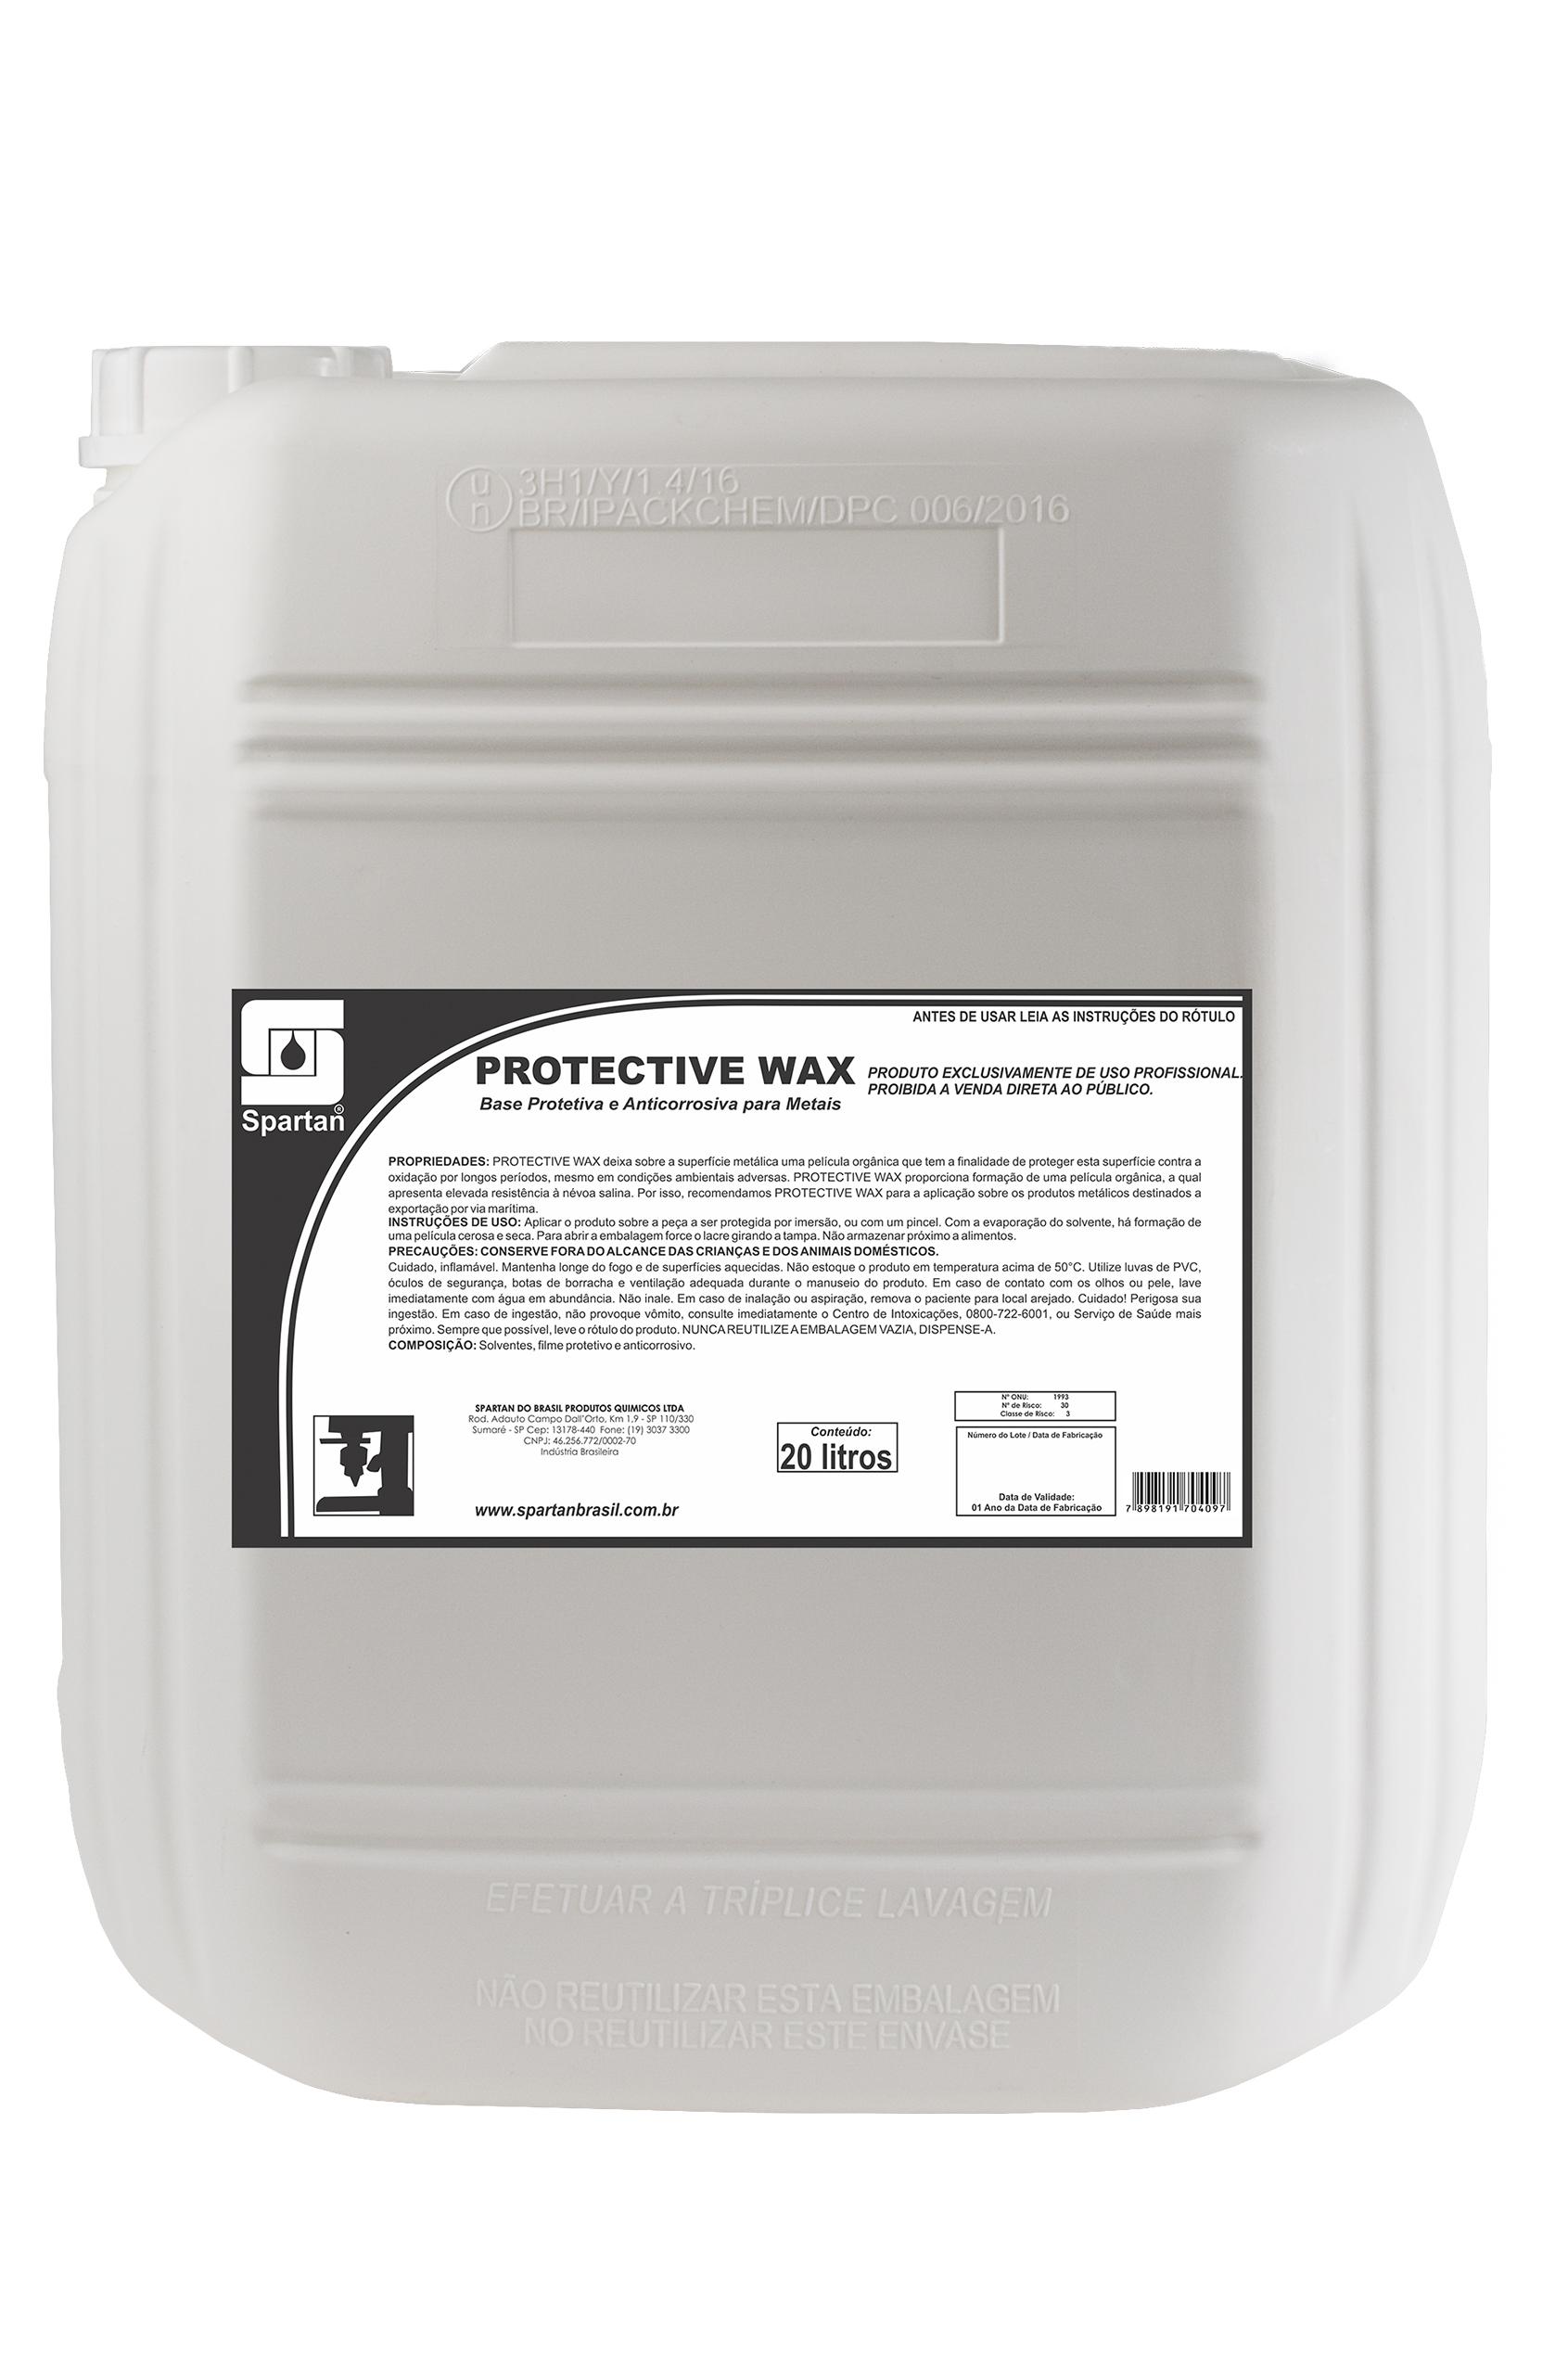 Imagem ilustrativa do produto: Protective Wax